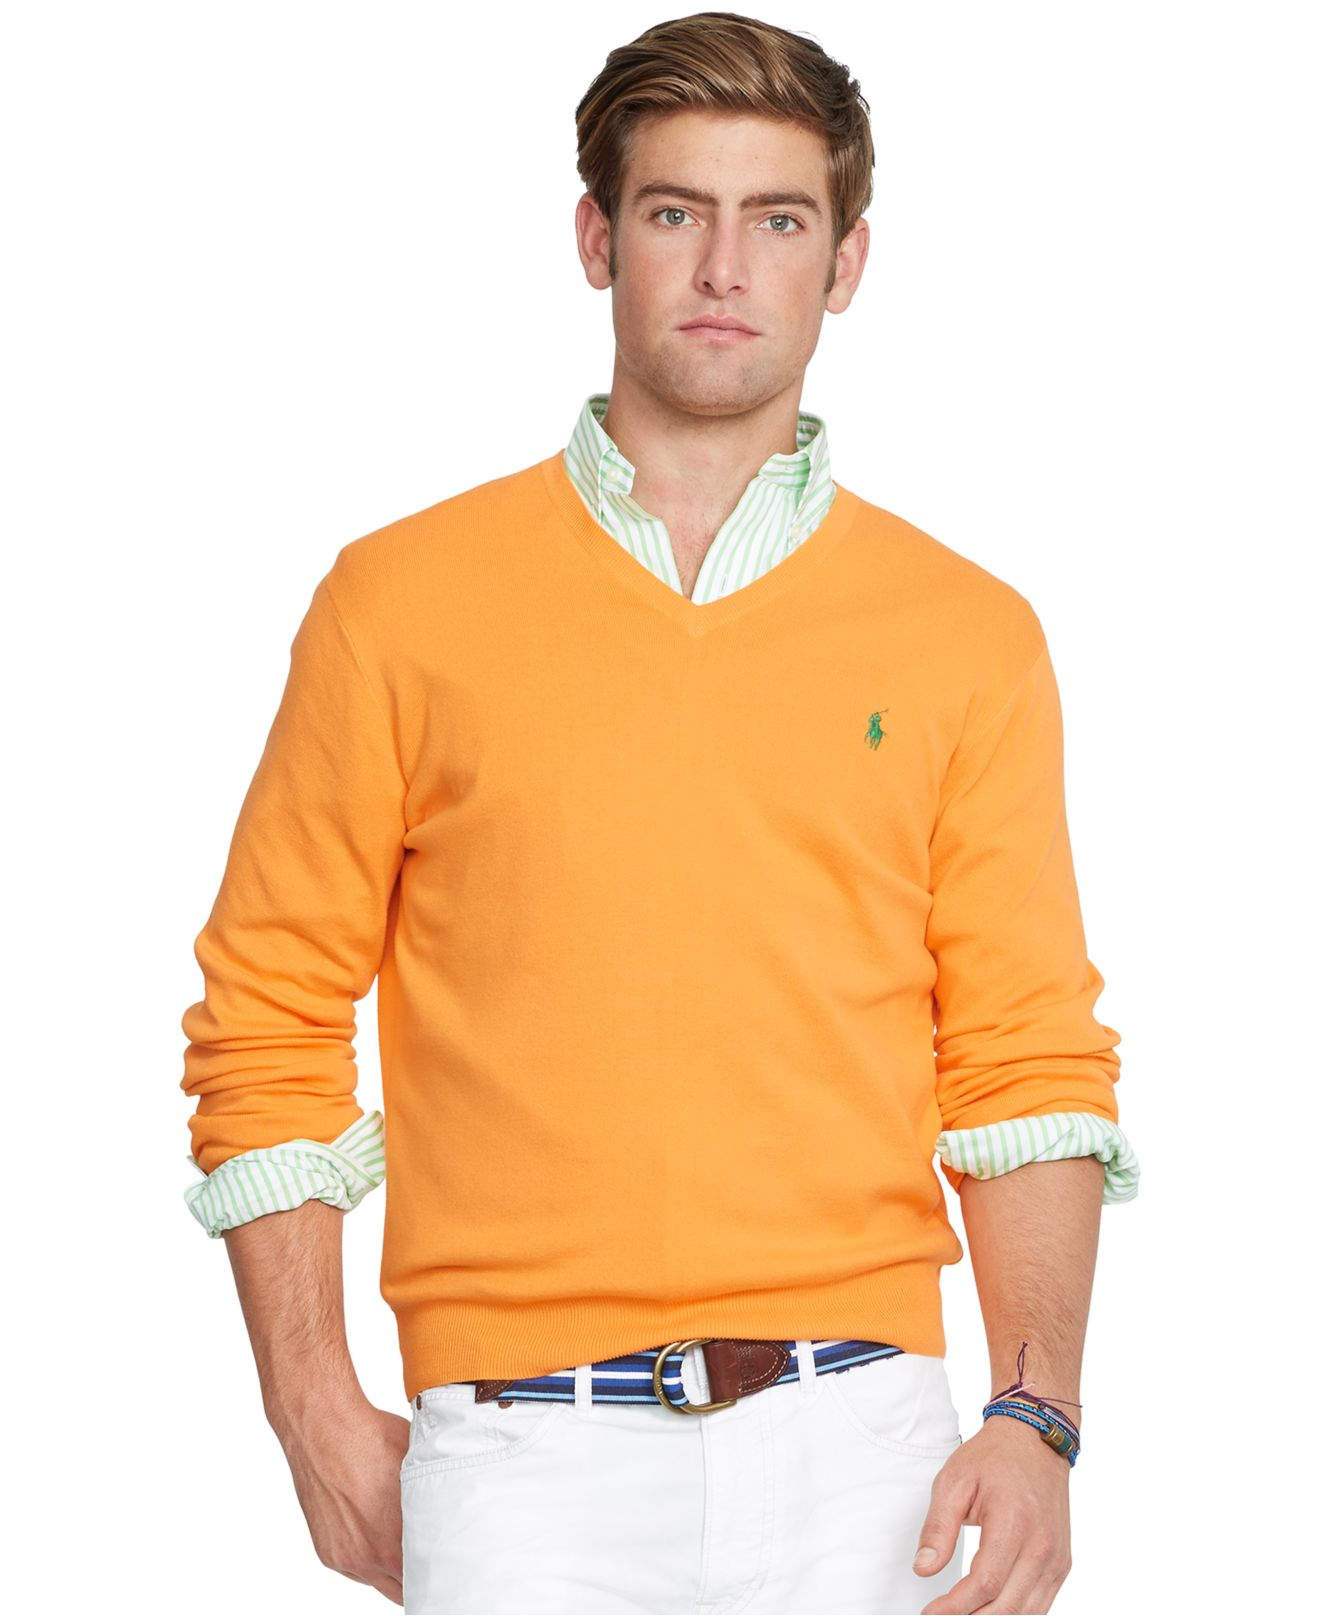 polo ralph lauren pima v neck sweater in orange for men hot coral lyst. Black Bedroom Furniture Sets. Home Design Ideas